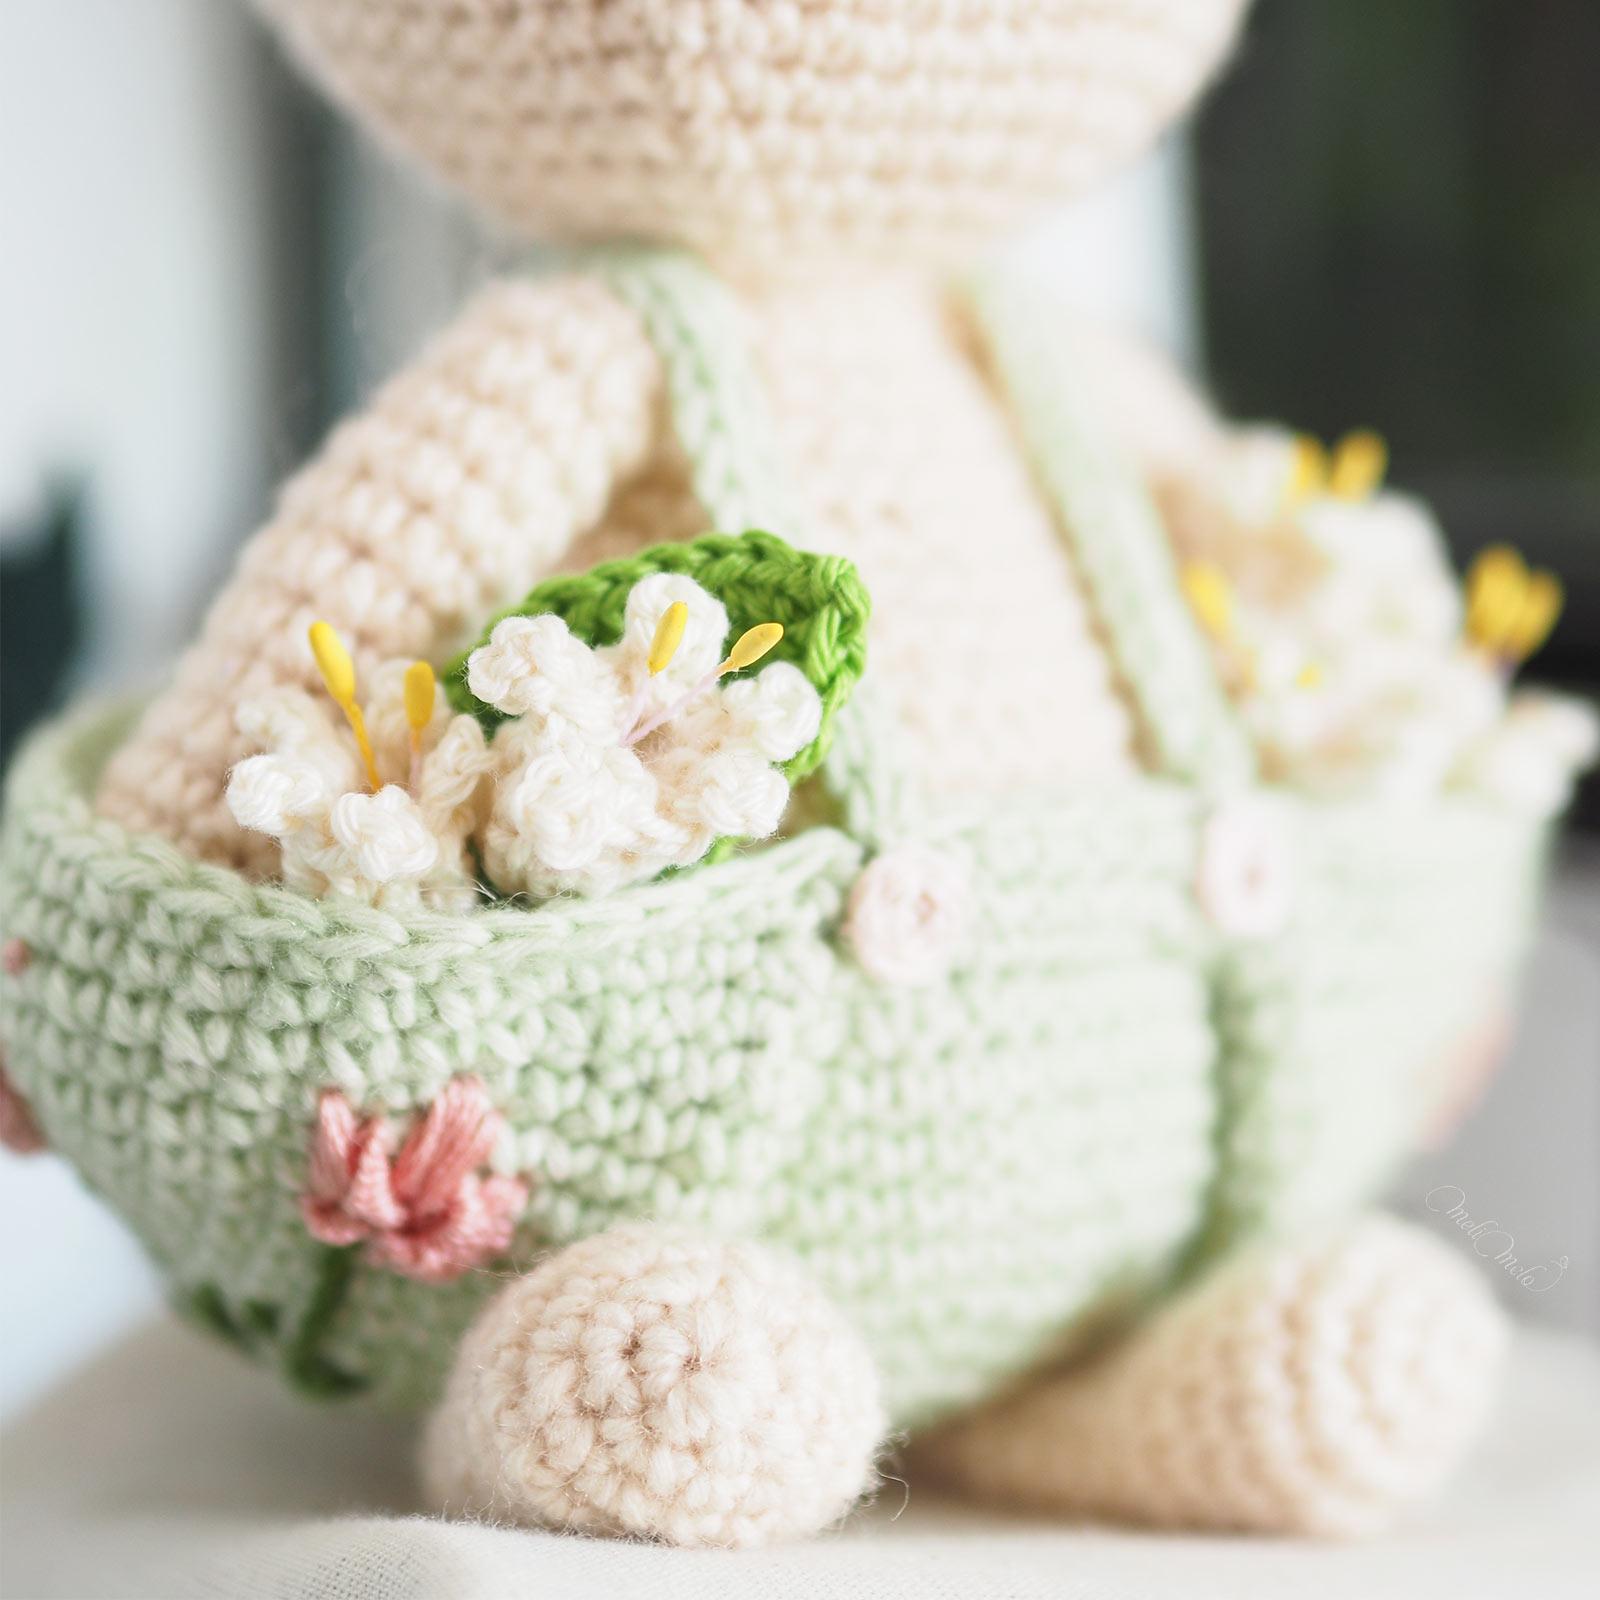 amigurumi-lapin-crochet-muguet-poche-salopette-laboutiquedemelimelo